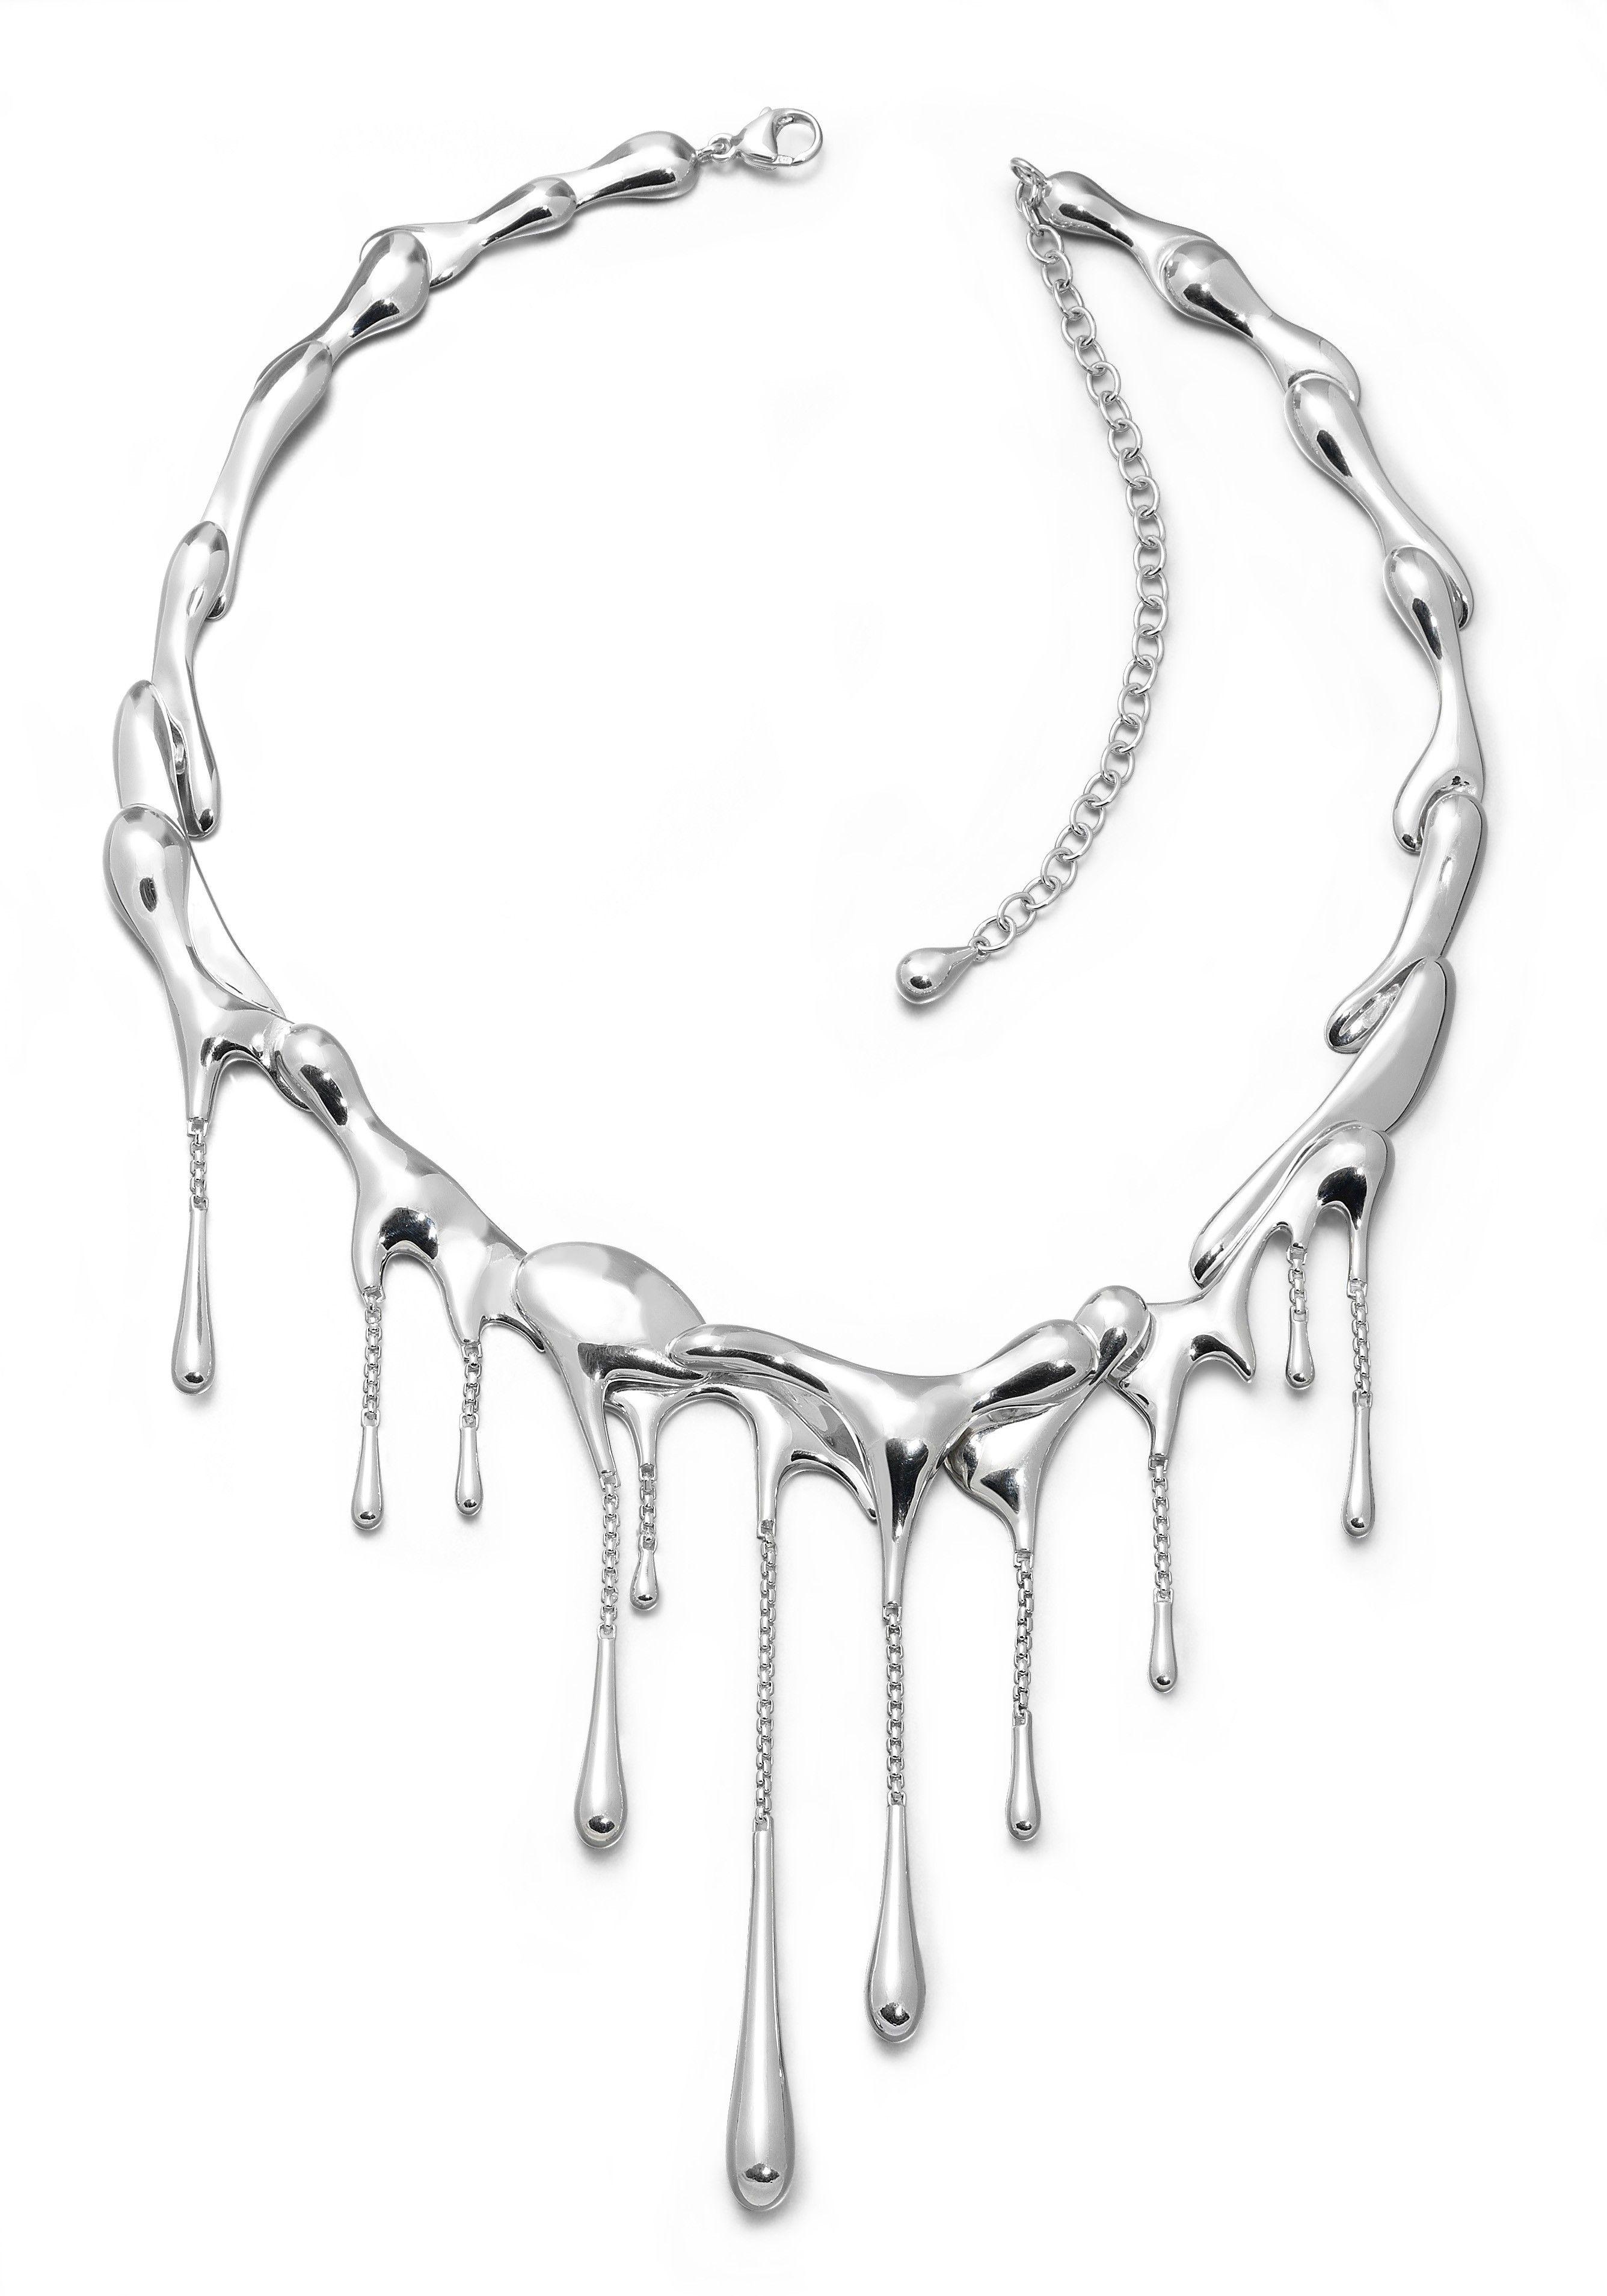 Lucy Quartermaine Waterfall Choker Necklace lF3NHd